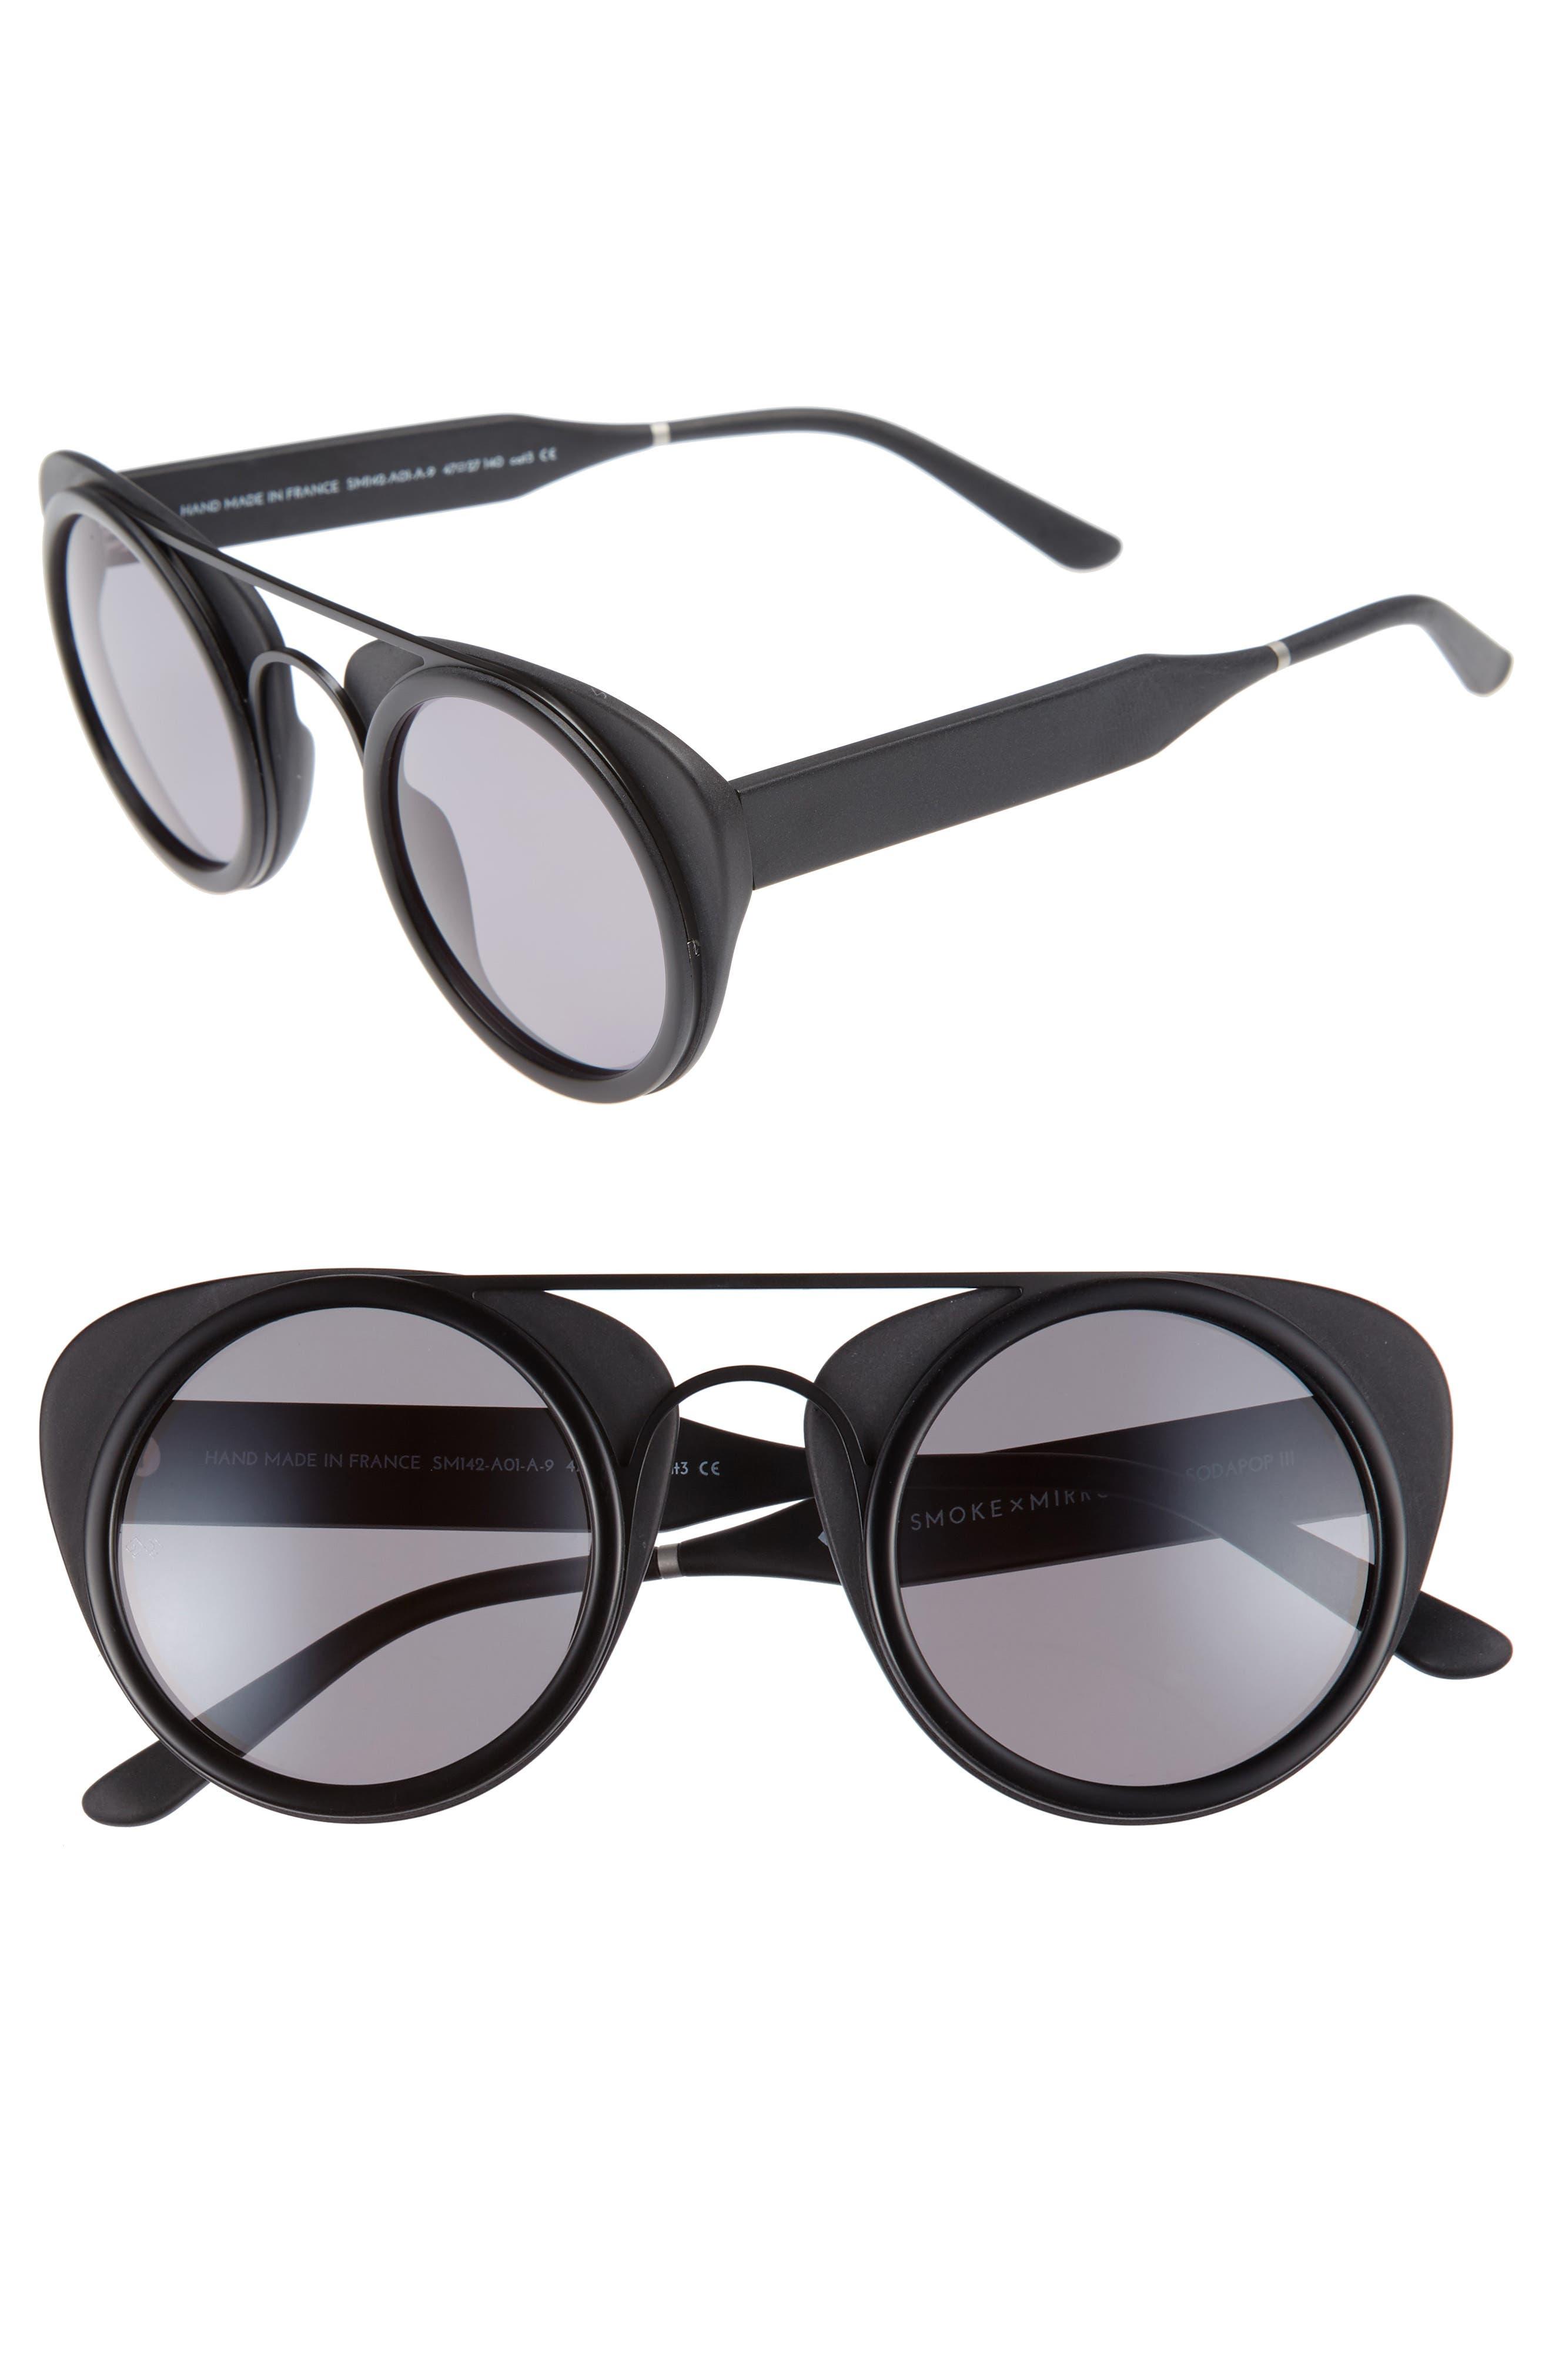 Soda Pop 3 47mm Retro Sunglasses,                             Main thumbnail 1, color,                             001